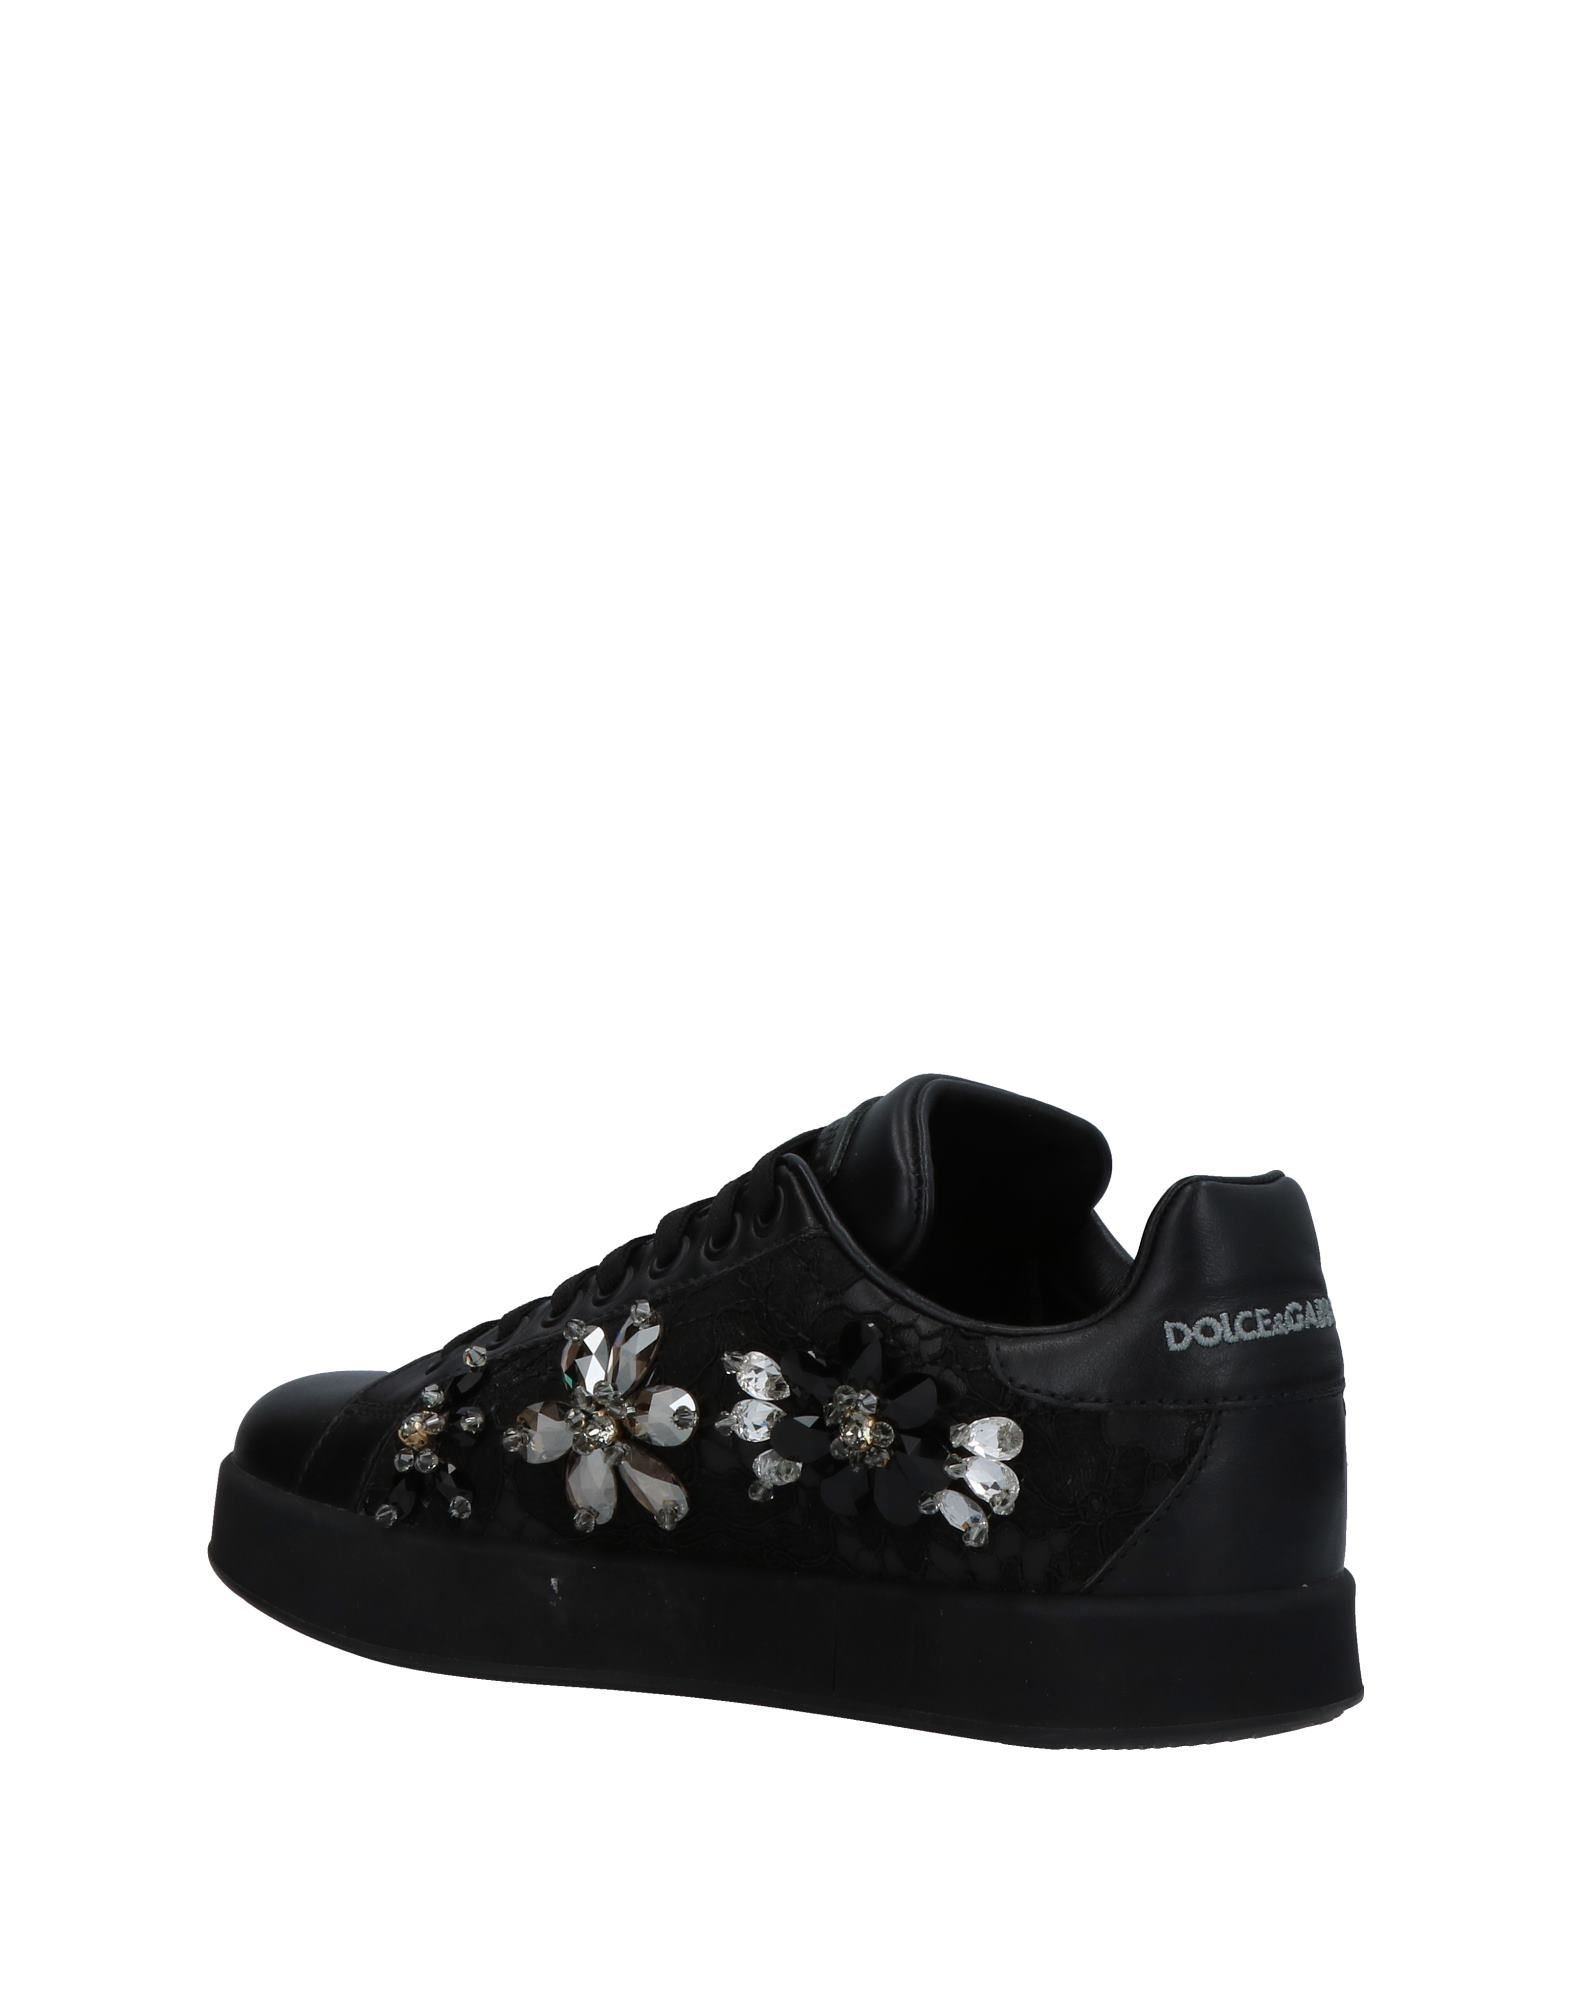 Dolce & Damen Gabbana Sneakers Damen &  11407957TS Neue Schuhe ec3c48